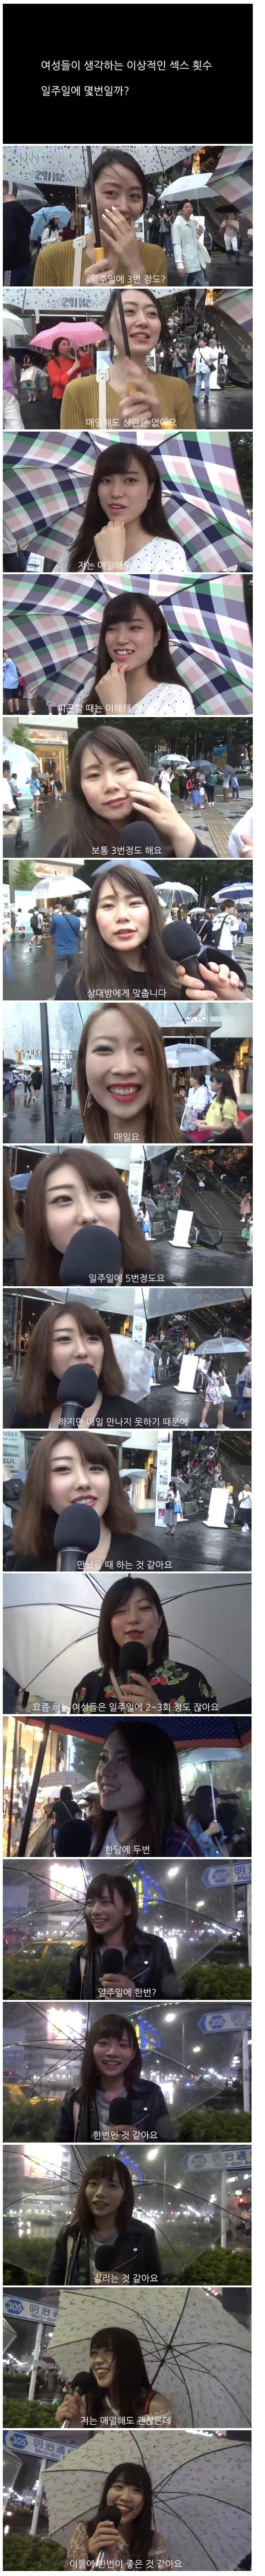 1596246131854074.jpg 일본여자 사귈때 신중해야 하는 이유.jpg